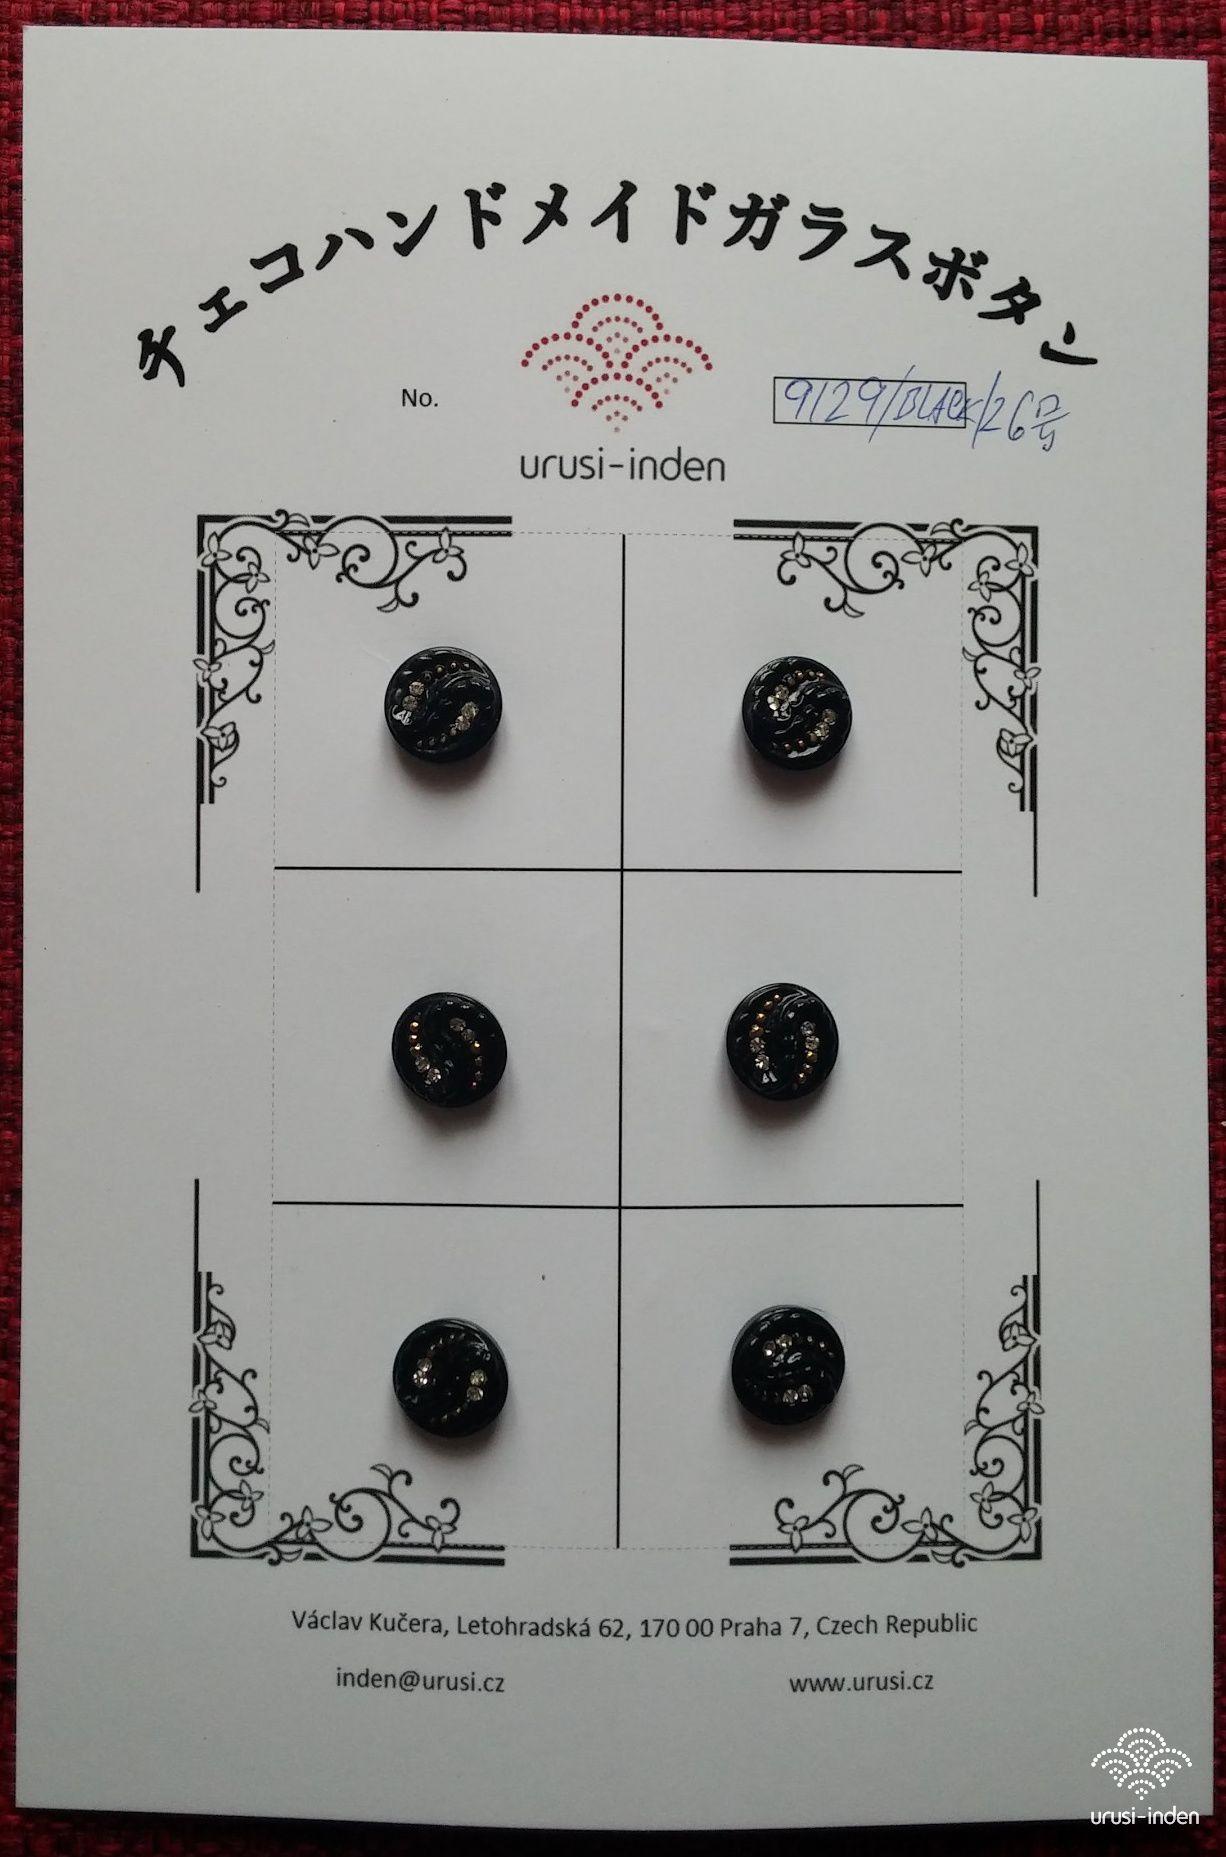 glass button card 9129 black 2 size 6 6 pcs urusi inden. Black Bedroom Furniture Sets. Home Design Ideas